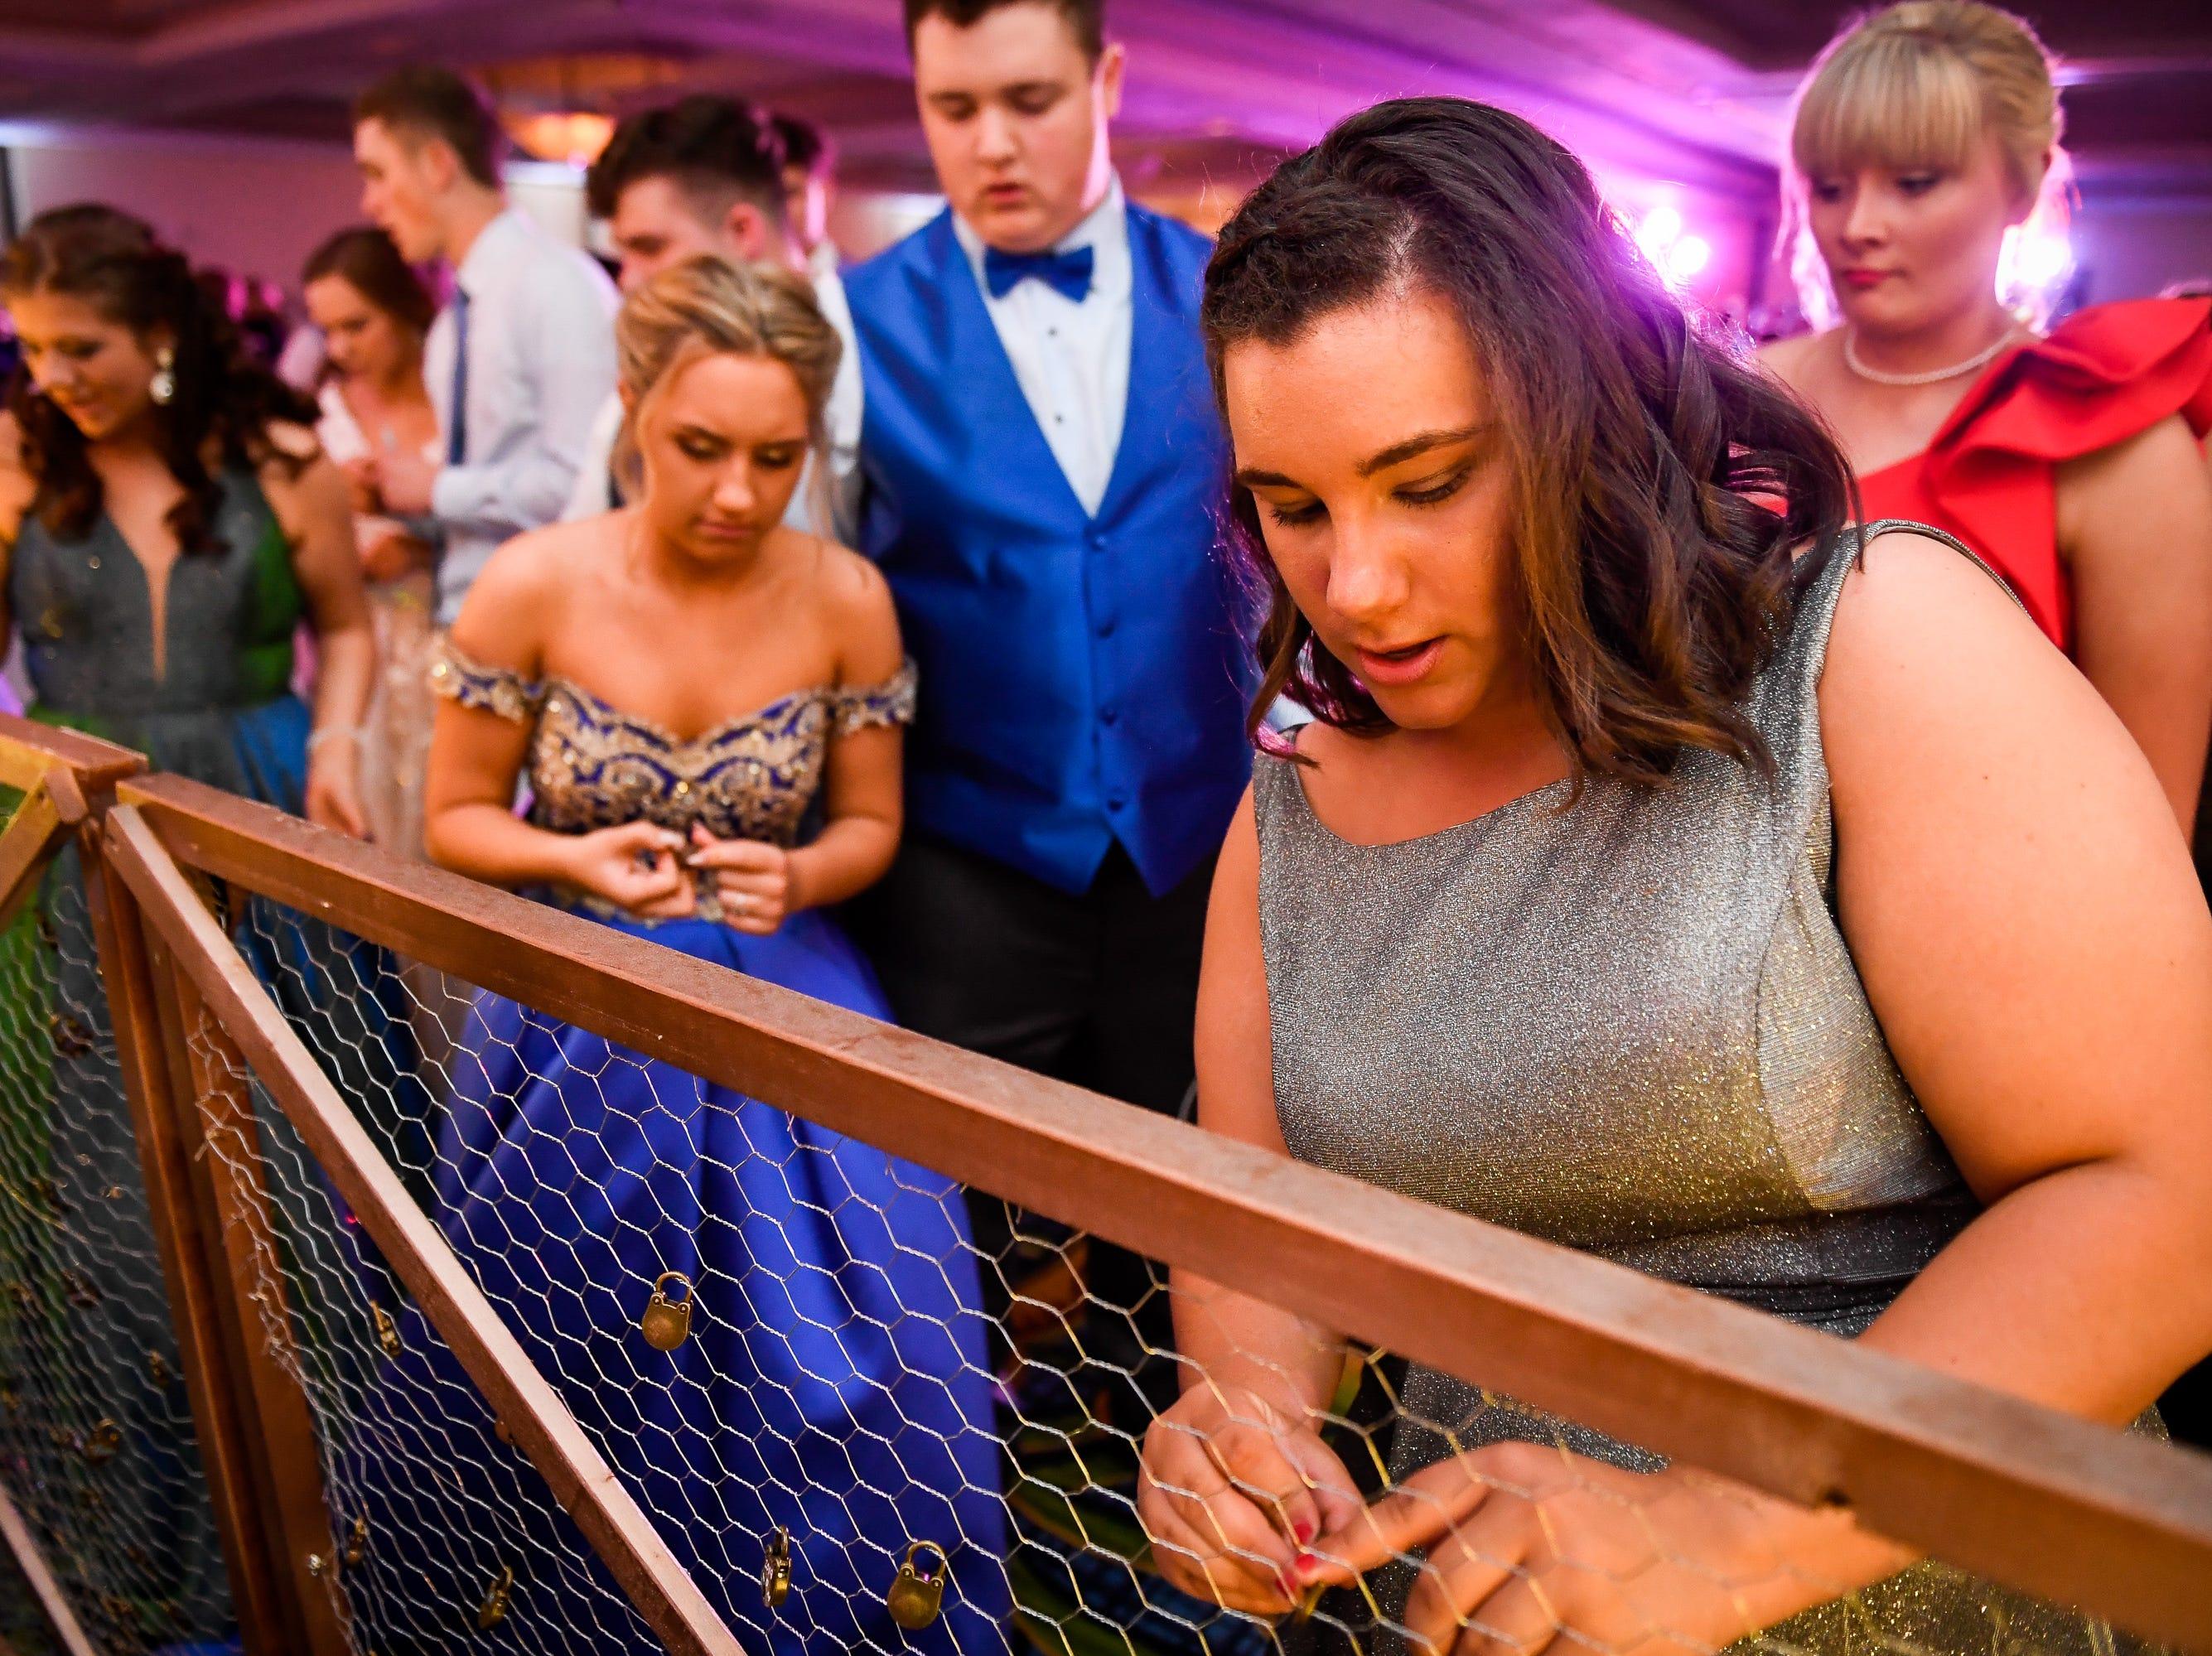 Leah Beach, right, unlocks a souvenir lock at the Tecumseh High School prom held at the Airport Holiday Inn Friday, April 26, 2019.